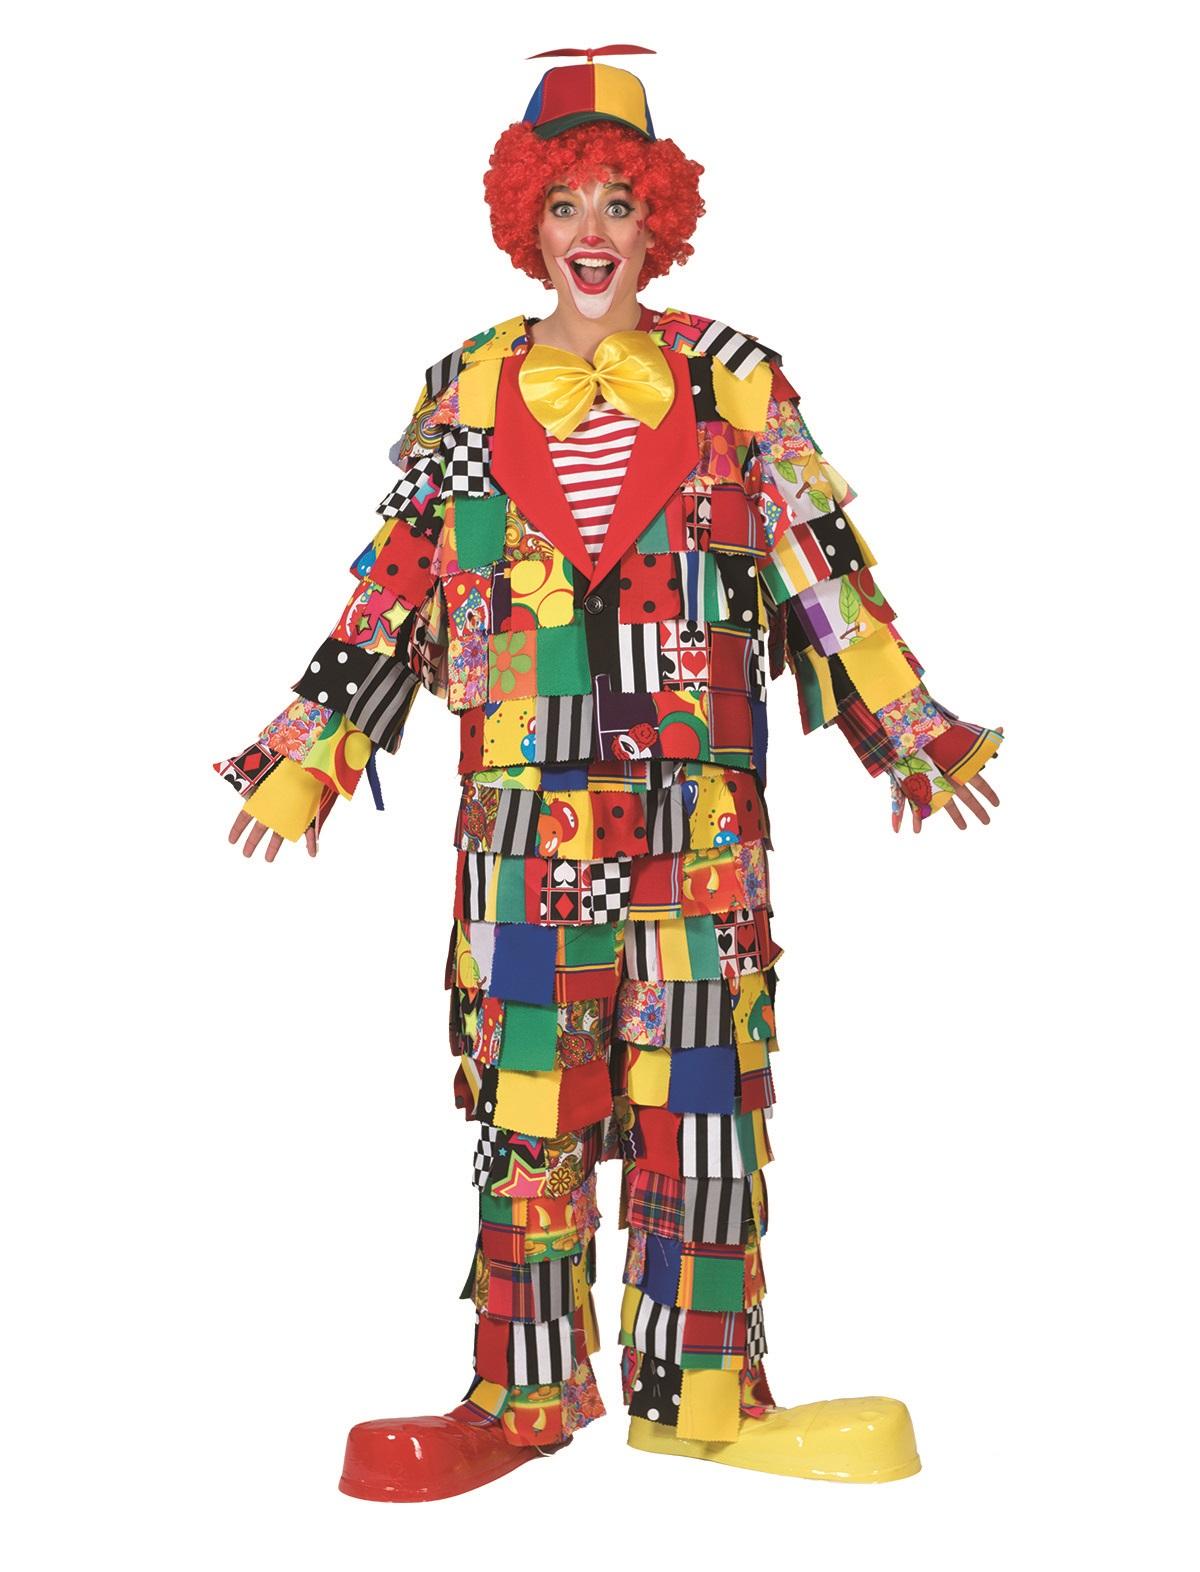 Karneval Kostueme Fasching Clowns Lappenclown bunt Dame Herr1mzrfGj0MctRTKqsNJy602rFzsR